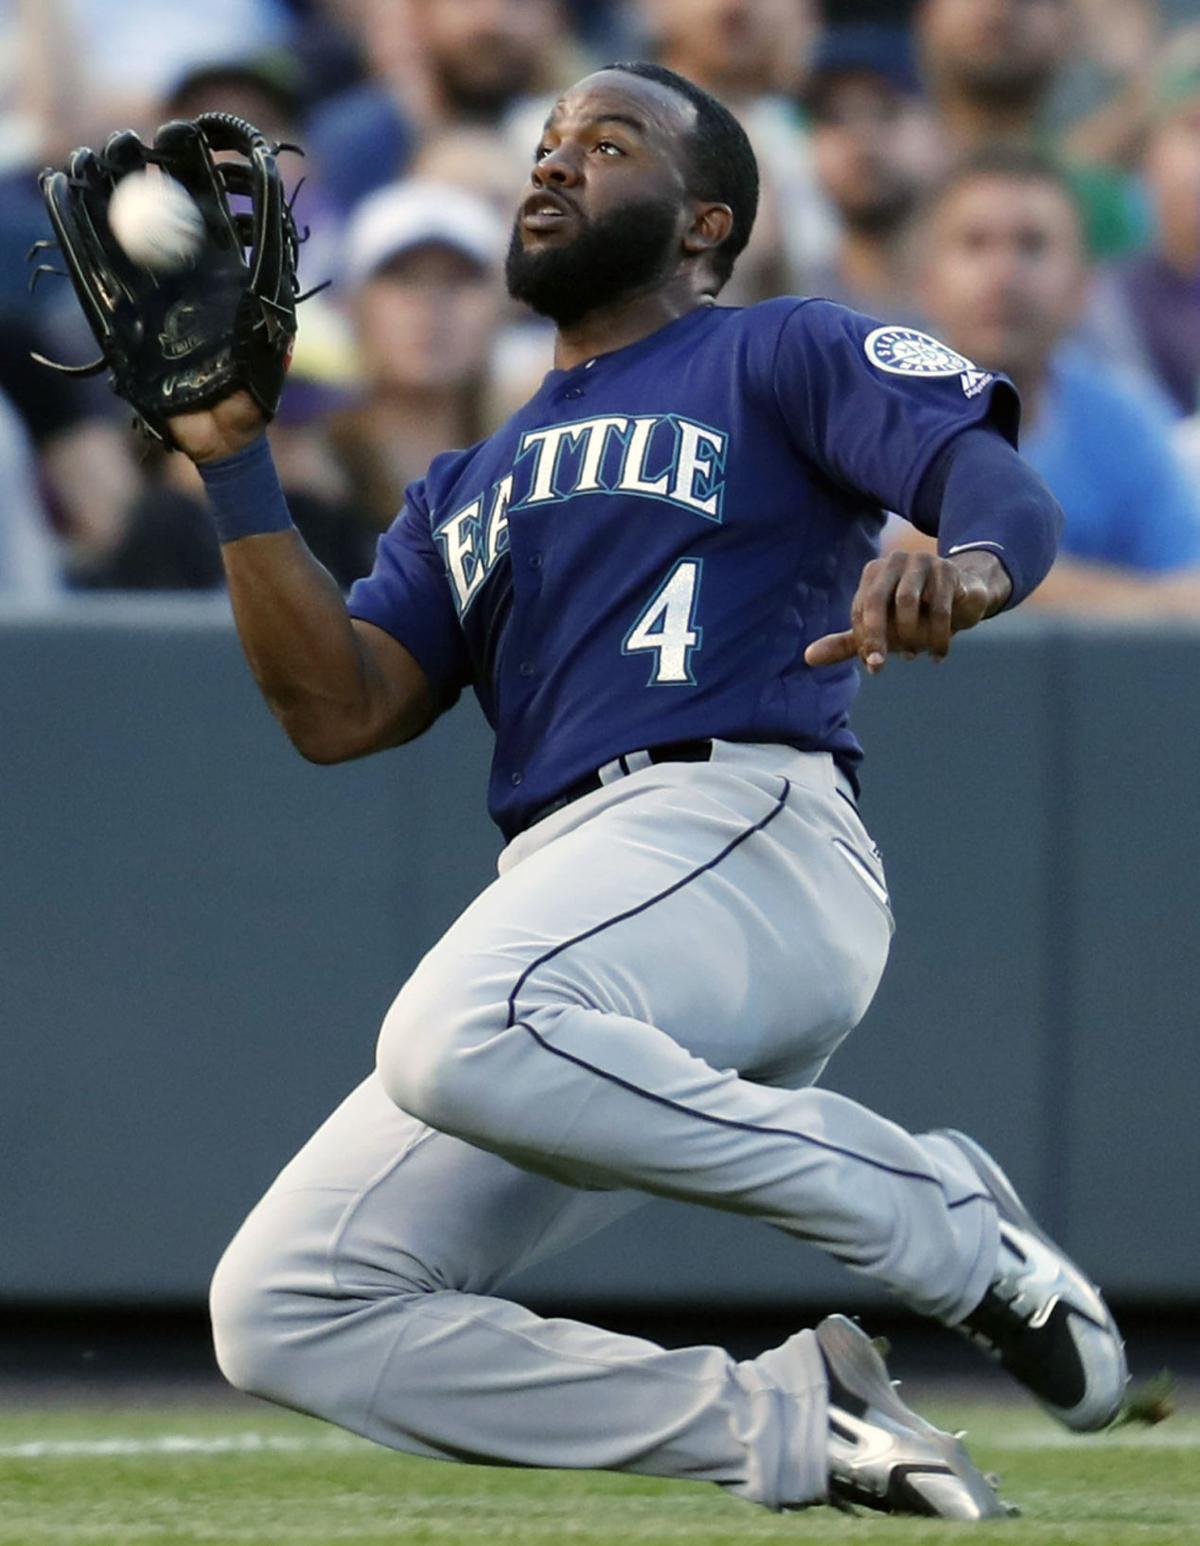 APTOPIX Mariners Rockies Baseball